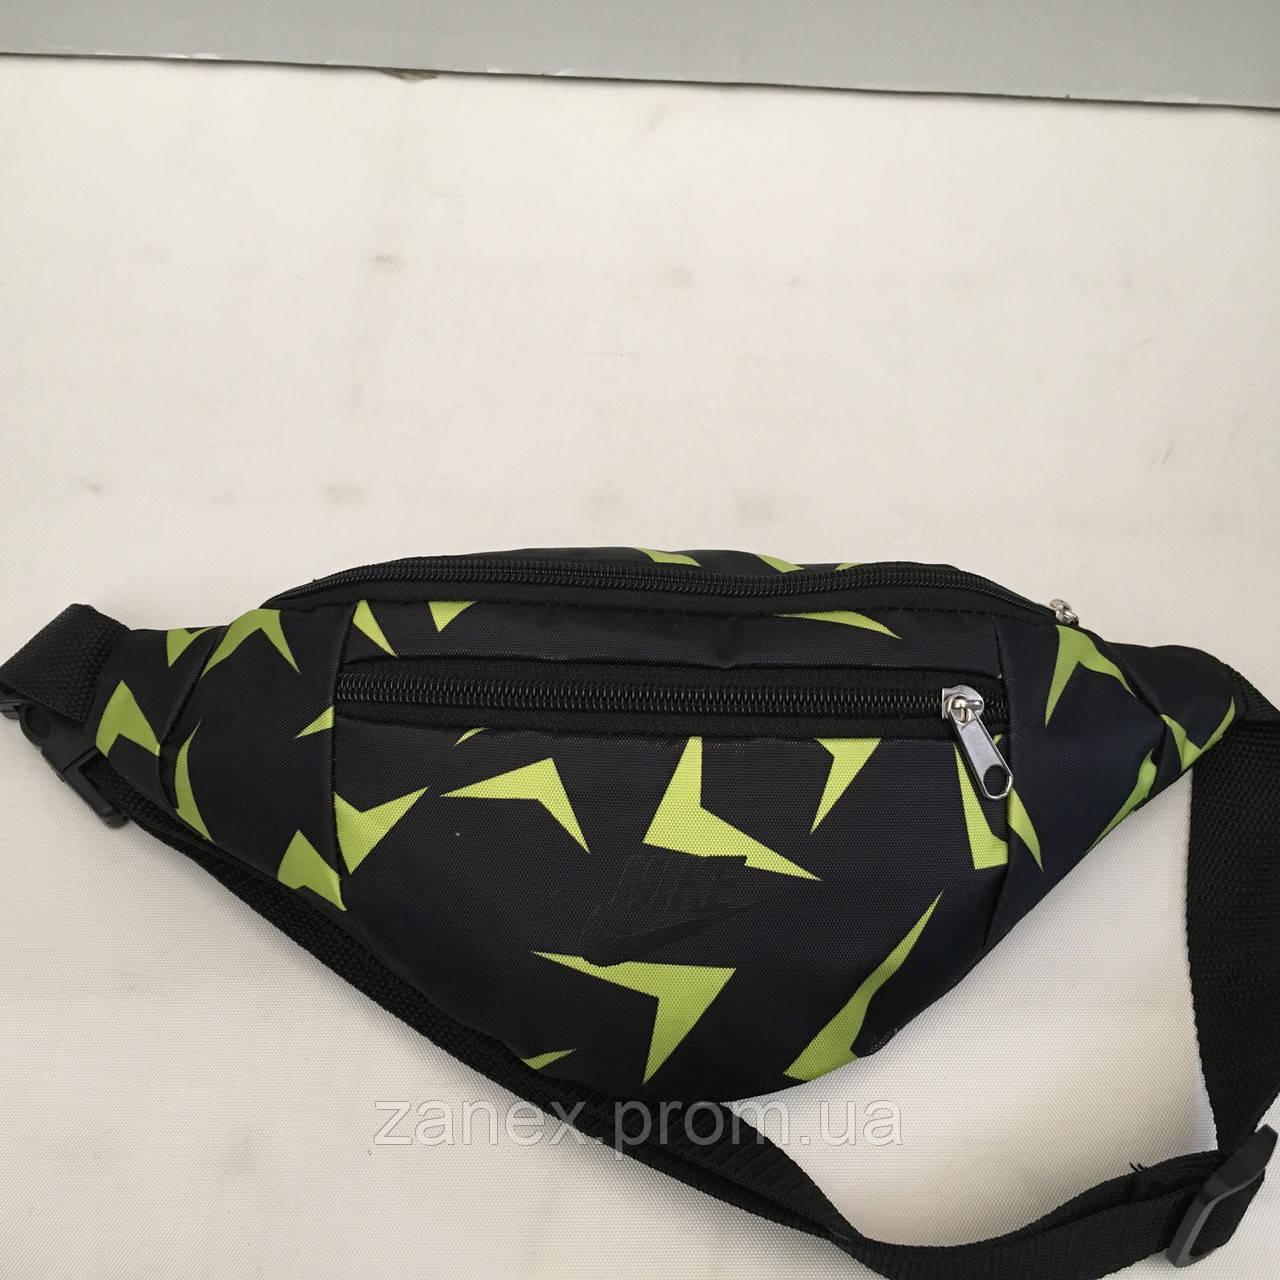 Поясная сумка черная Nike 2 отделения (Бананка, Сумка на пояс, сумка на плечо)